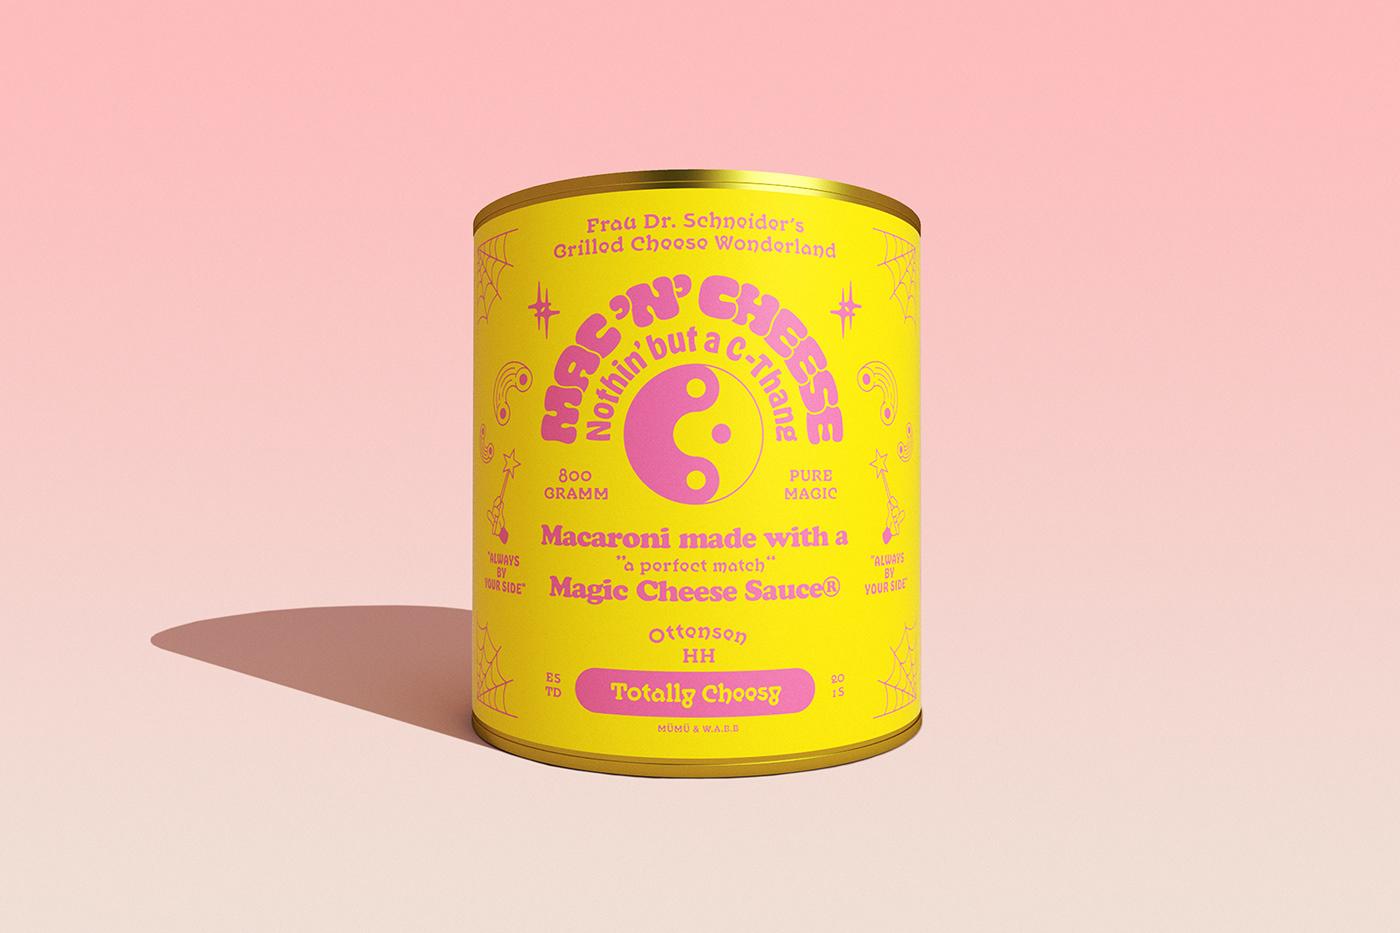 3D branding  CreativeDirection graphicdesign ILLUSTRATION  Packaging productdesign timomueller WABB wearebuerobuero